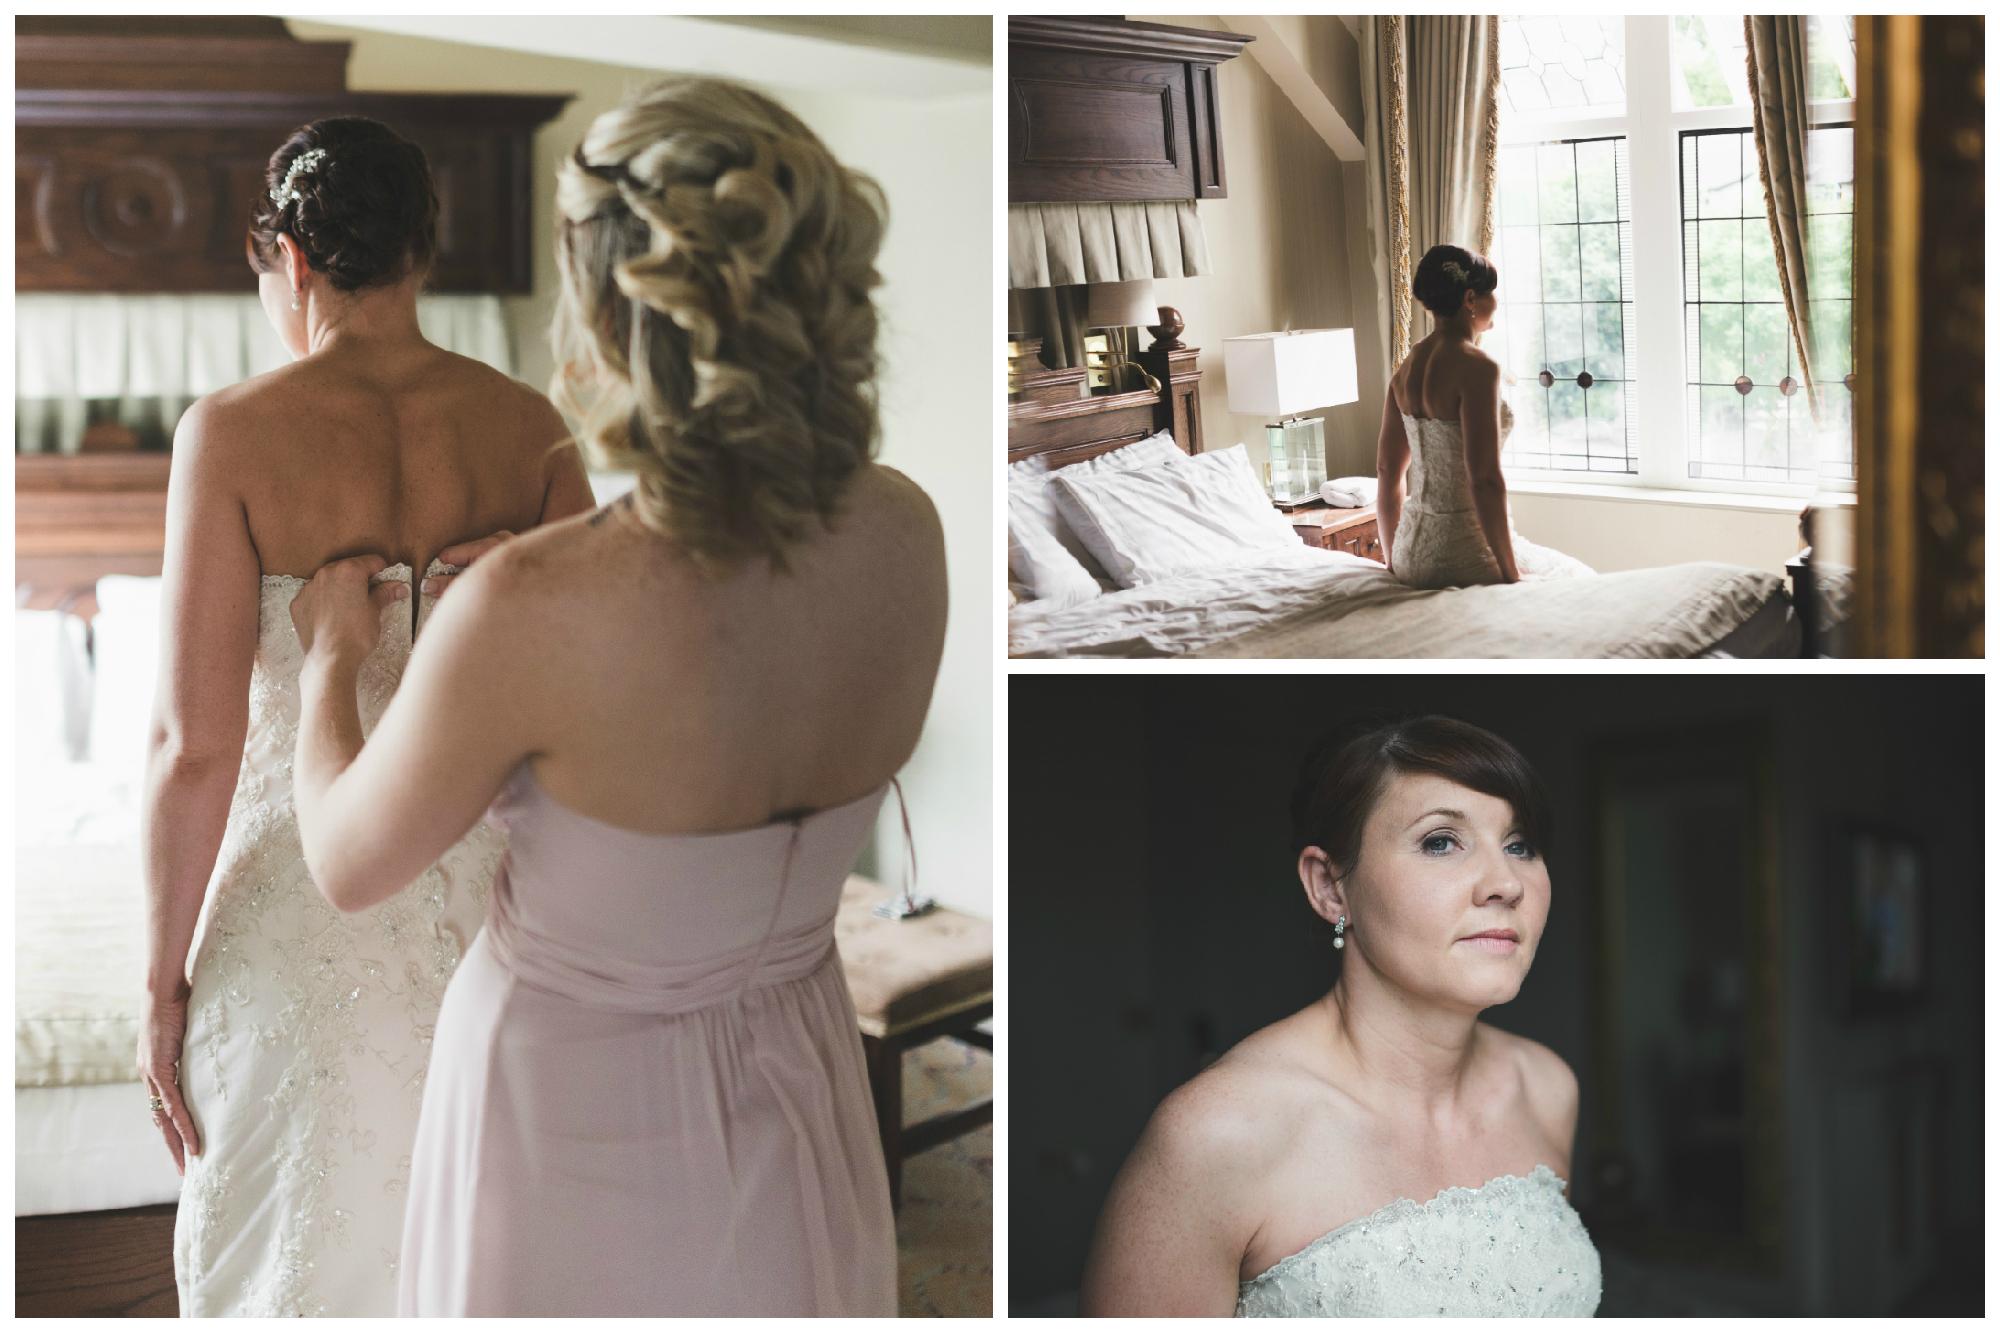 Bride_Window_Light_The_Old_Inn_Crawfordsburn